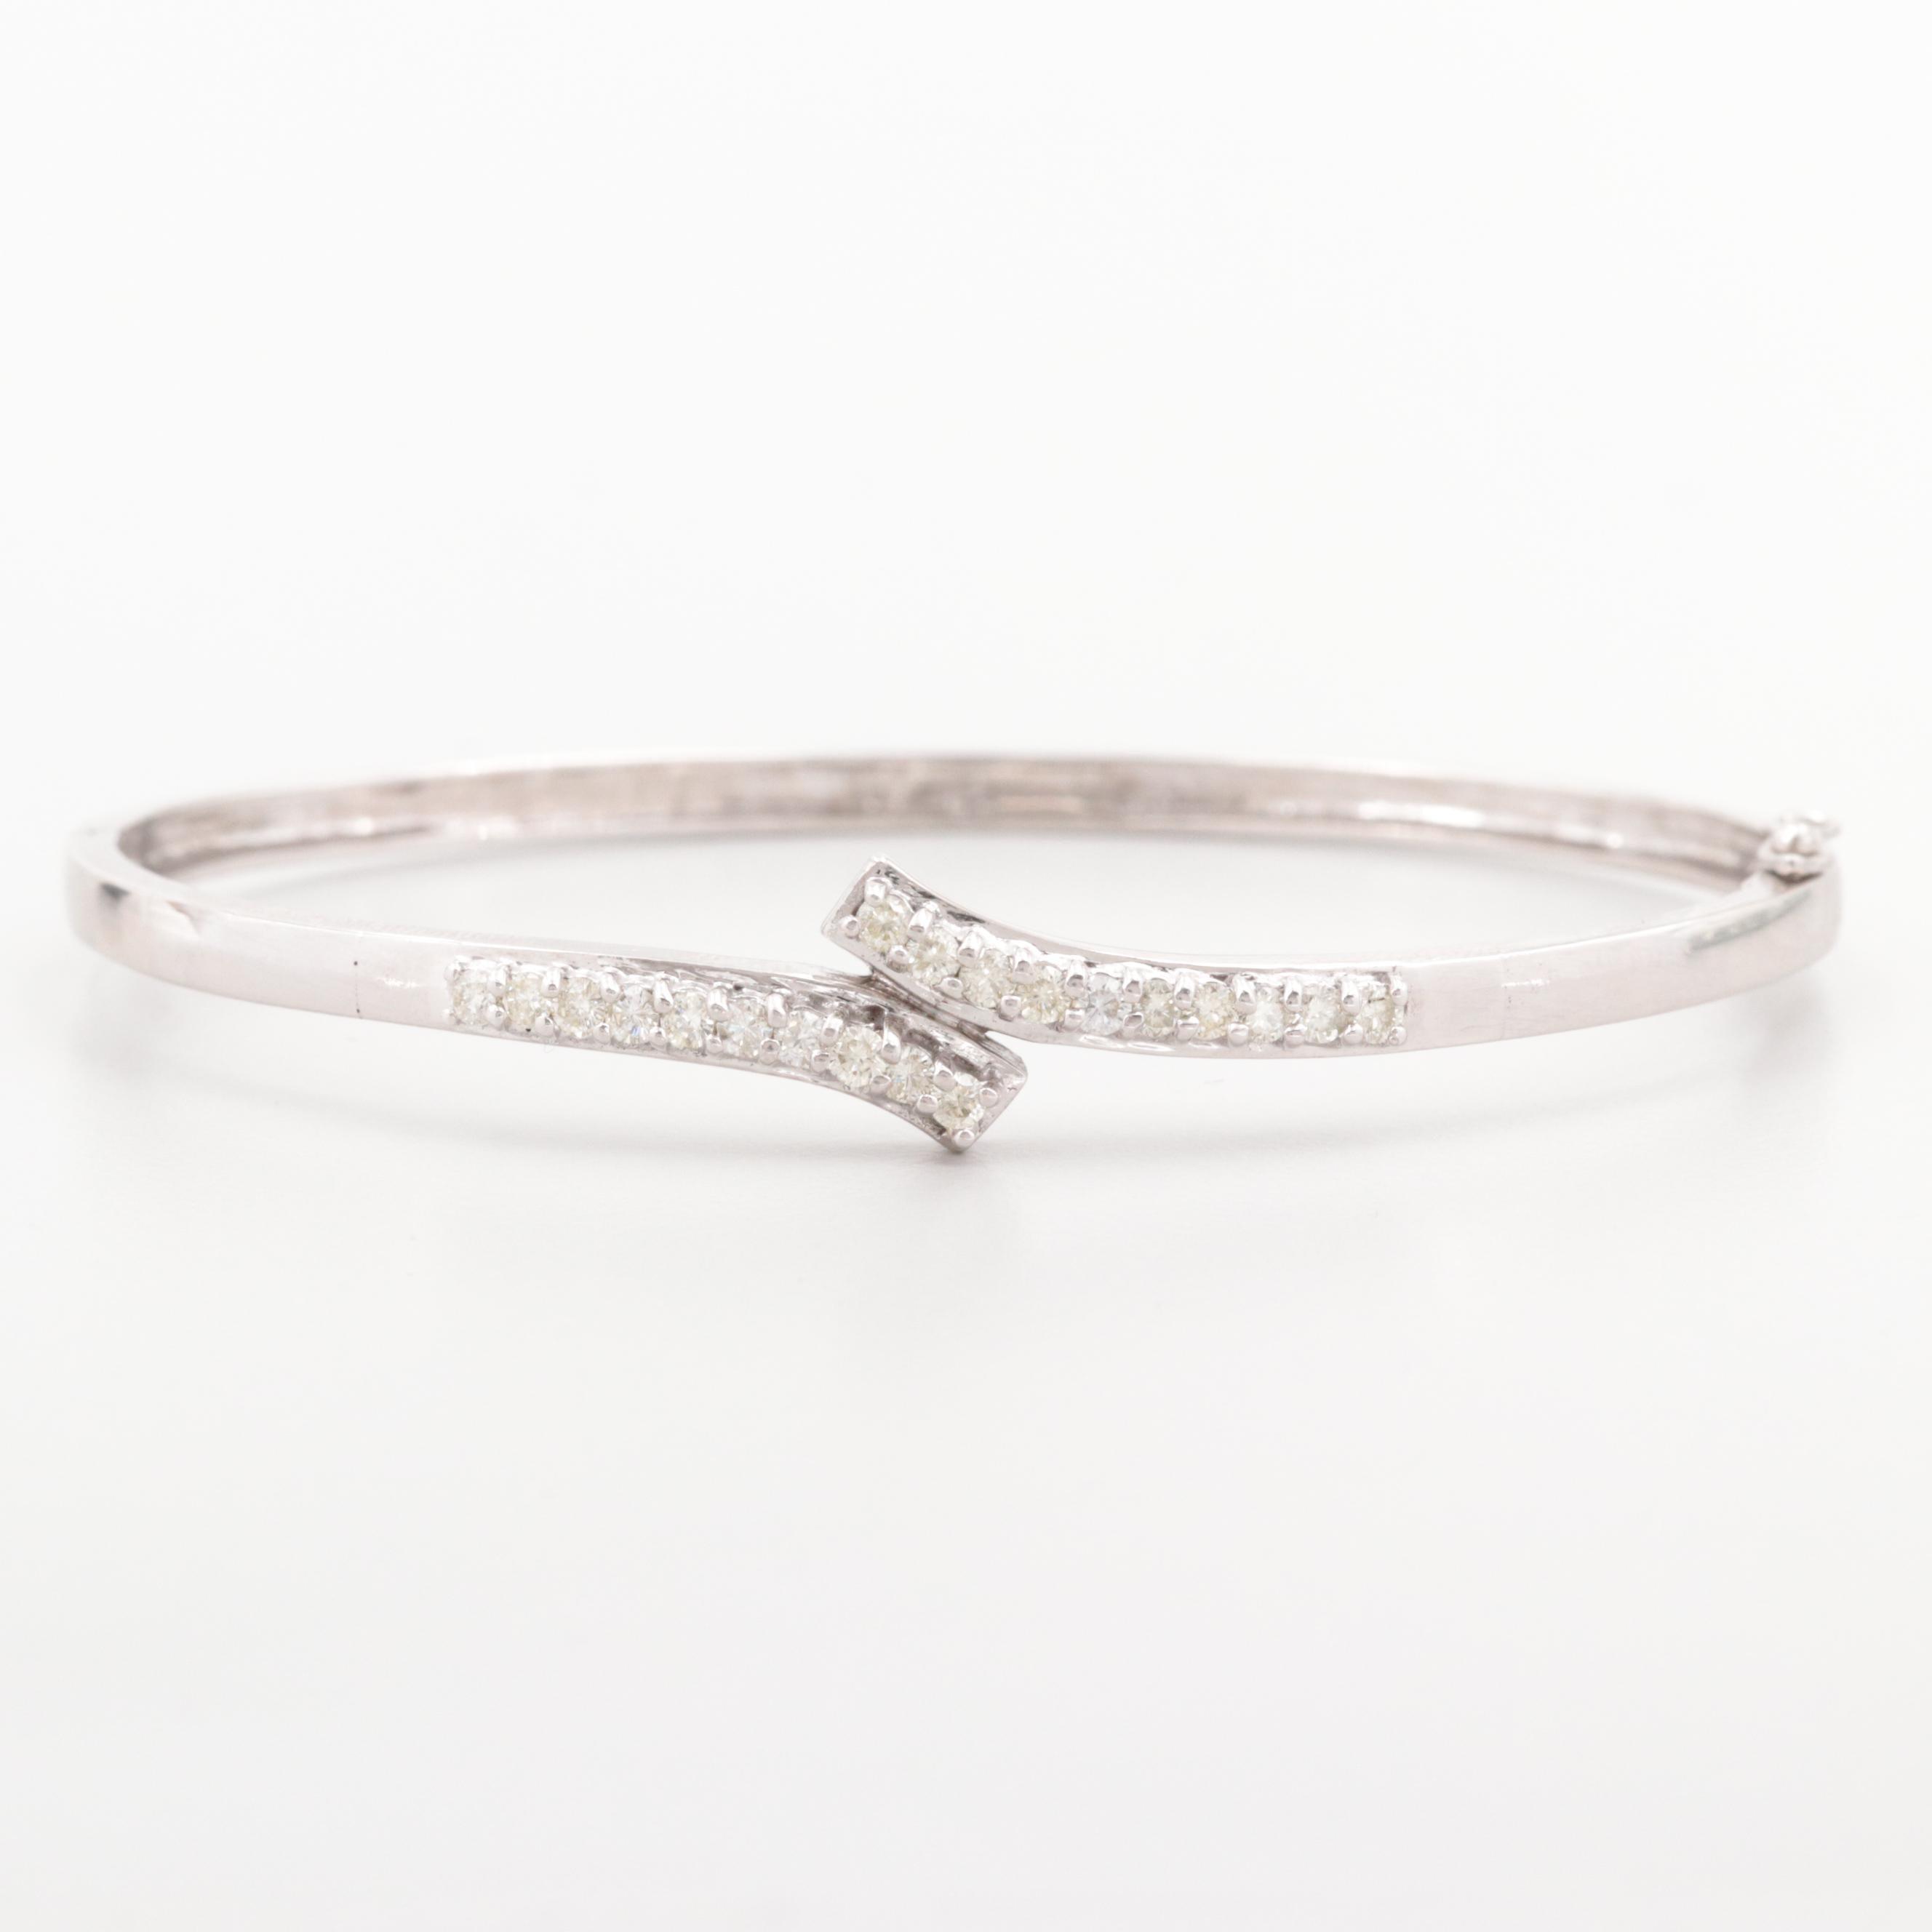 14K White Gold Diamond Bypass Bangle Bracelet